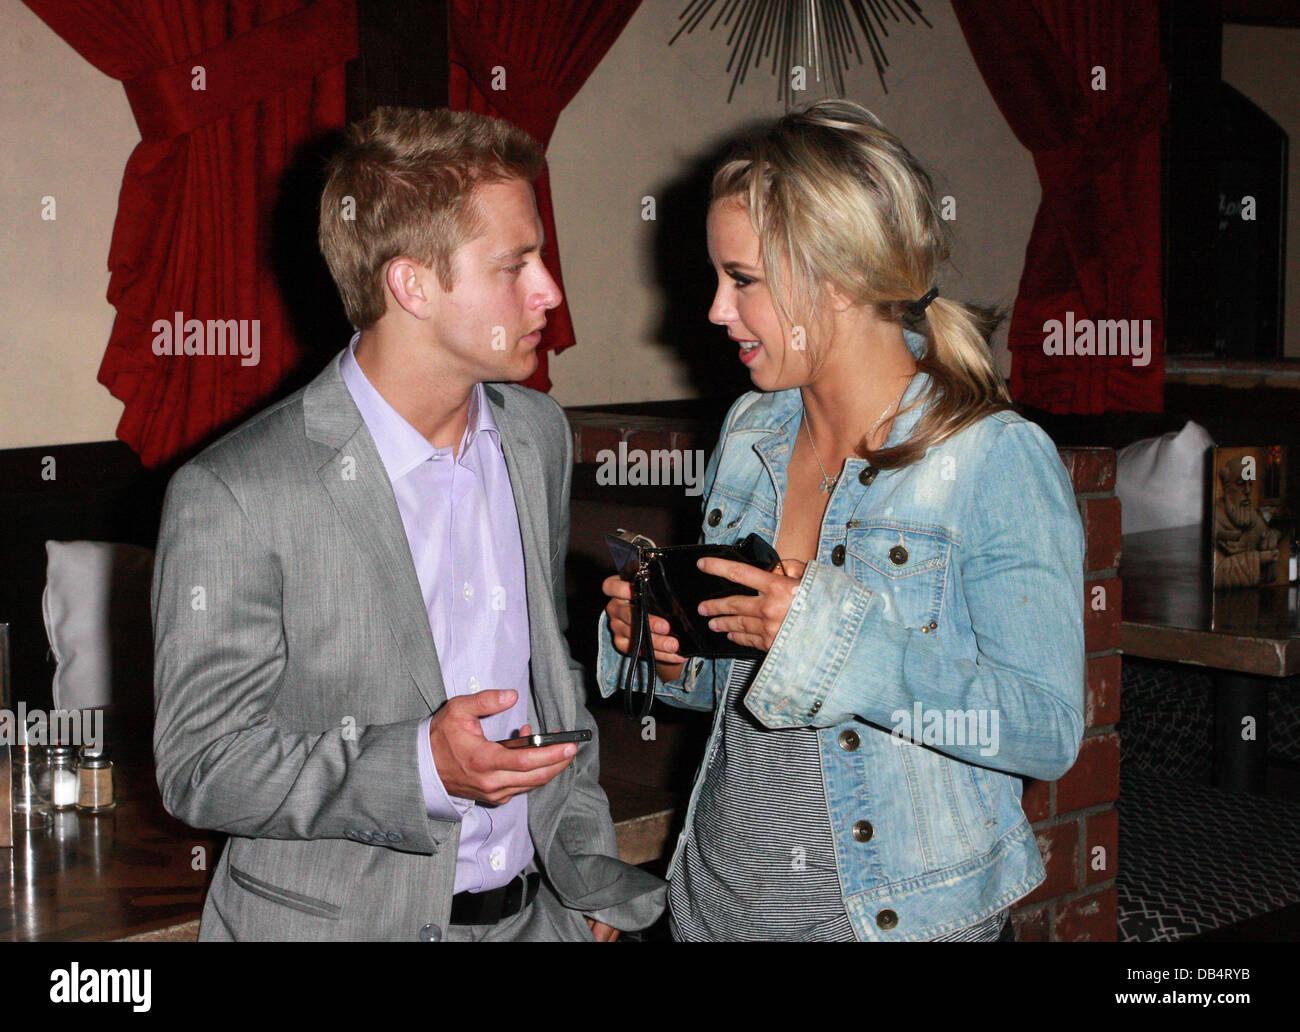 Alek.. Ryan Seacrest all but confirms hes dating ex-dancer Julianne Hough.